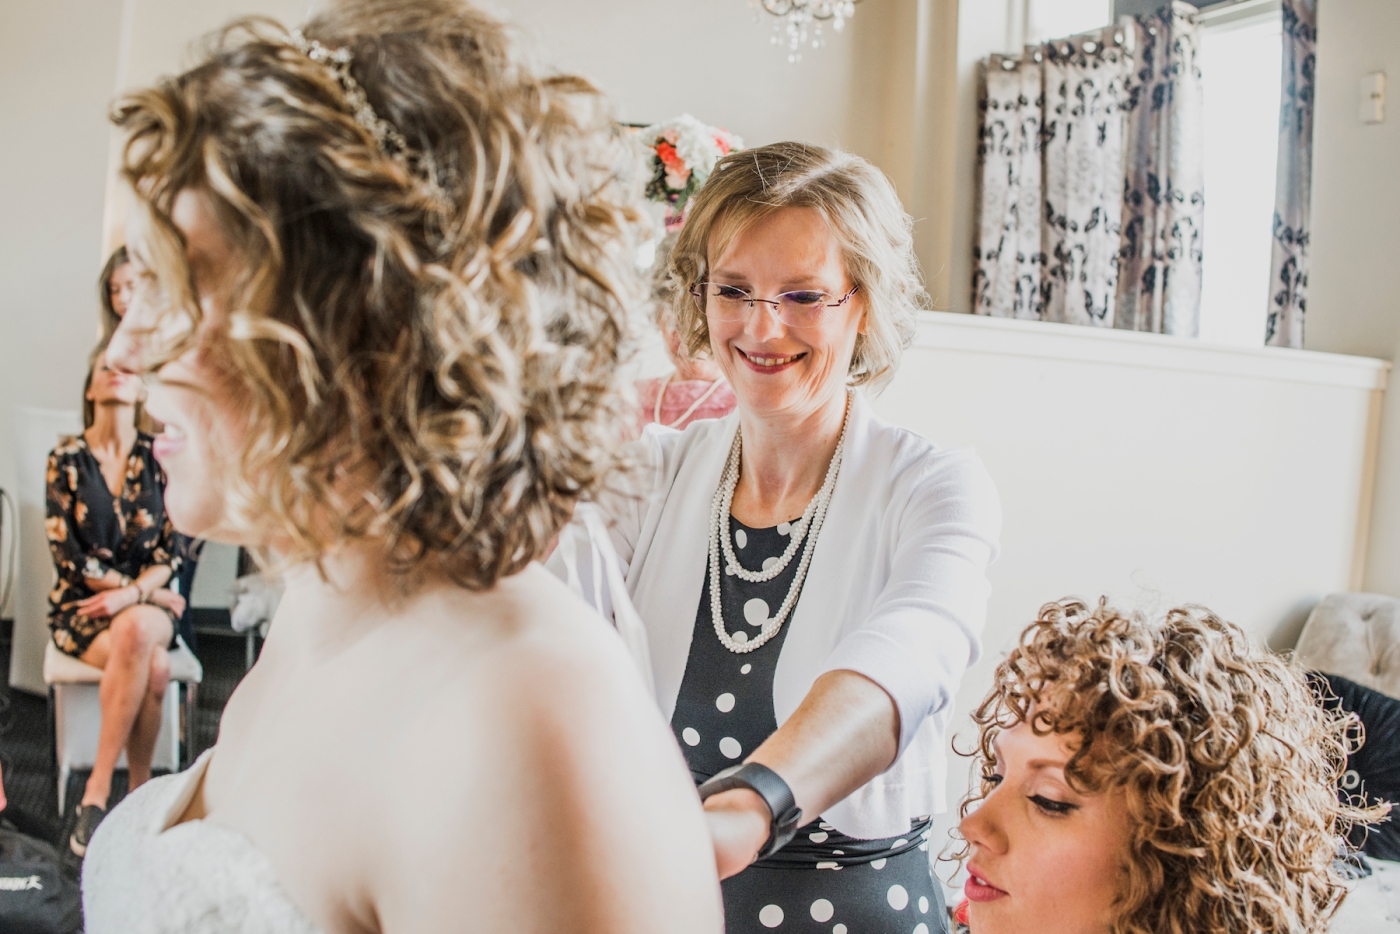 DSC_1866Everett_Wedding_Ballroom_Jane_Speleers_photography_Rachel_and_Edmund_Getting_ready_2017